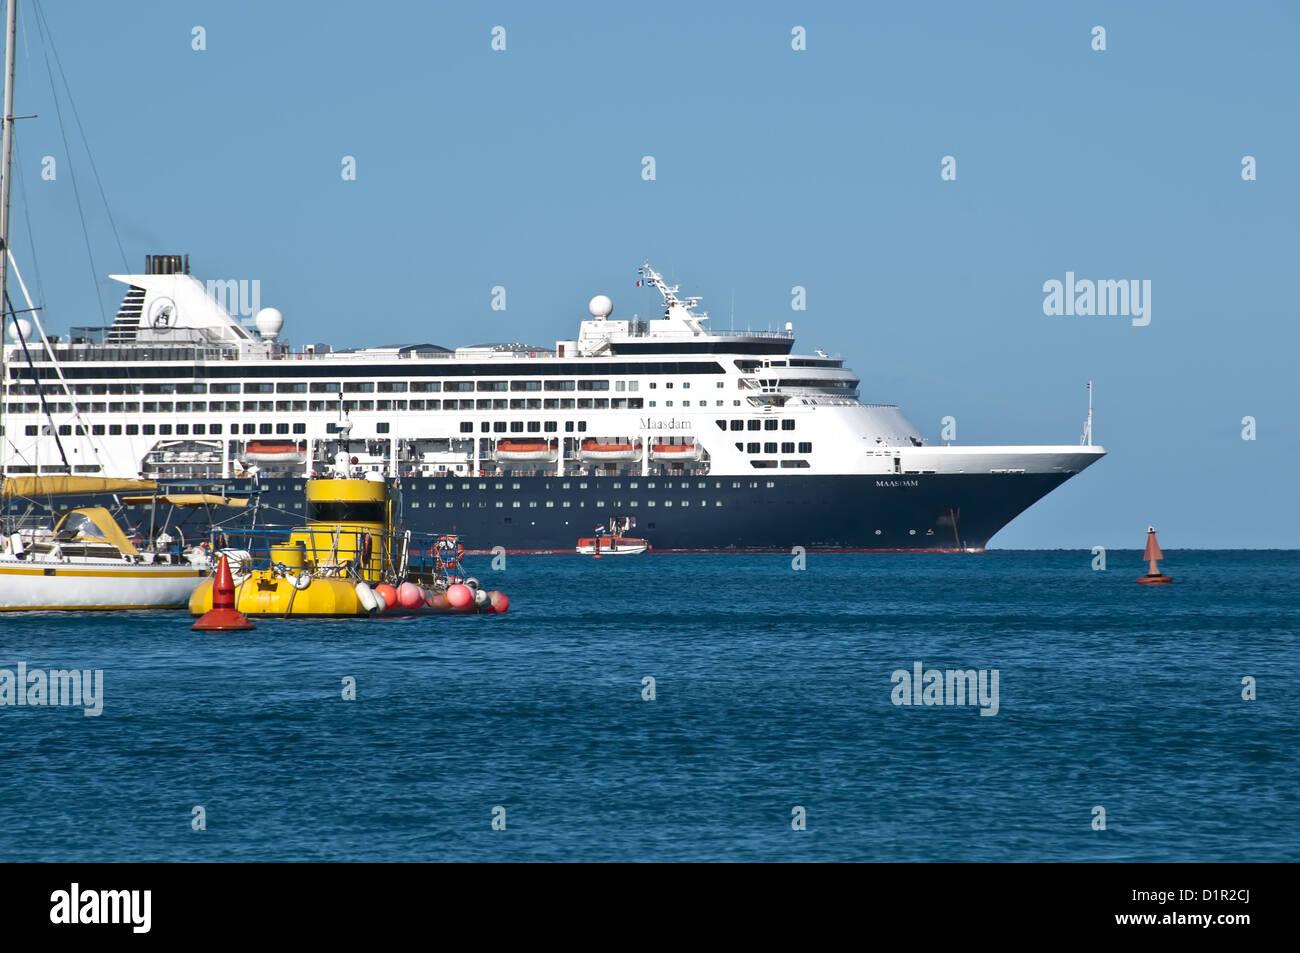 Holland America Maasdam, sailboat and yellow submarine, Saint Barthelemy - Stock Image